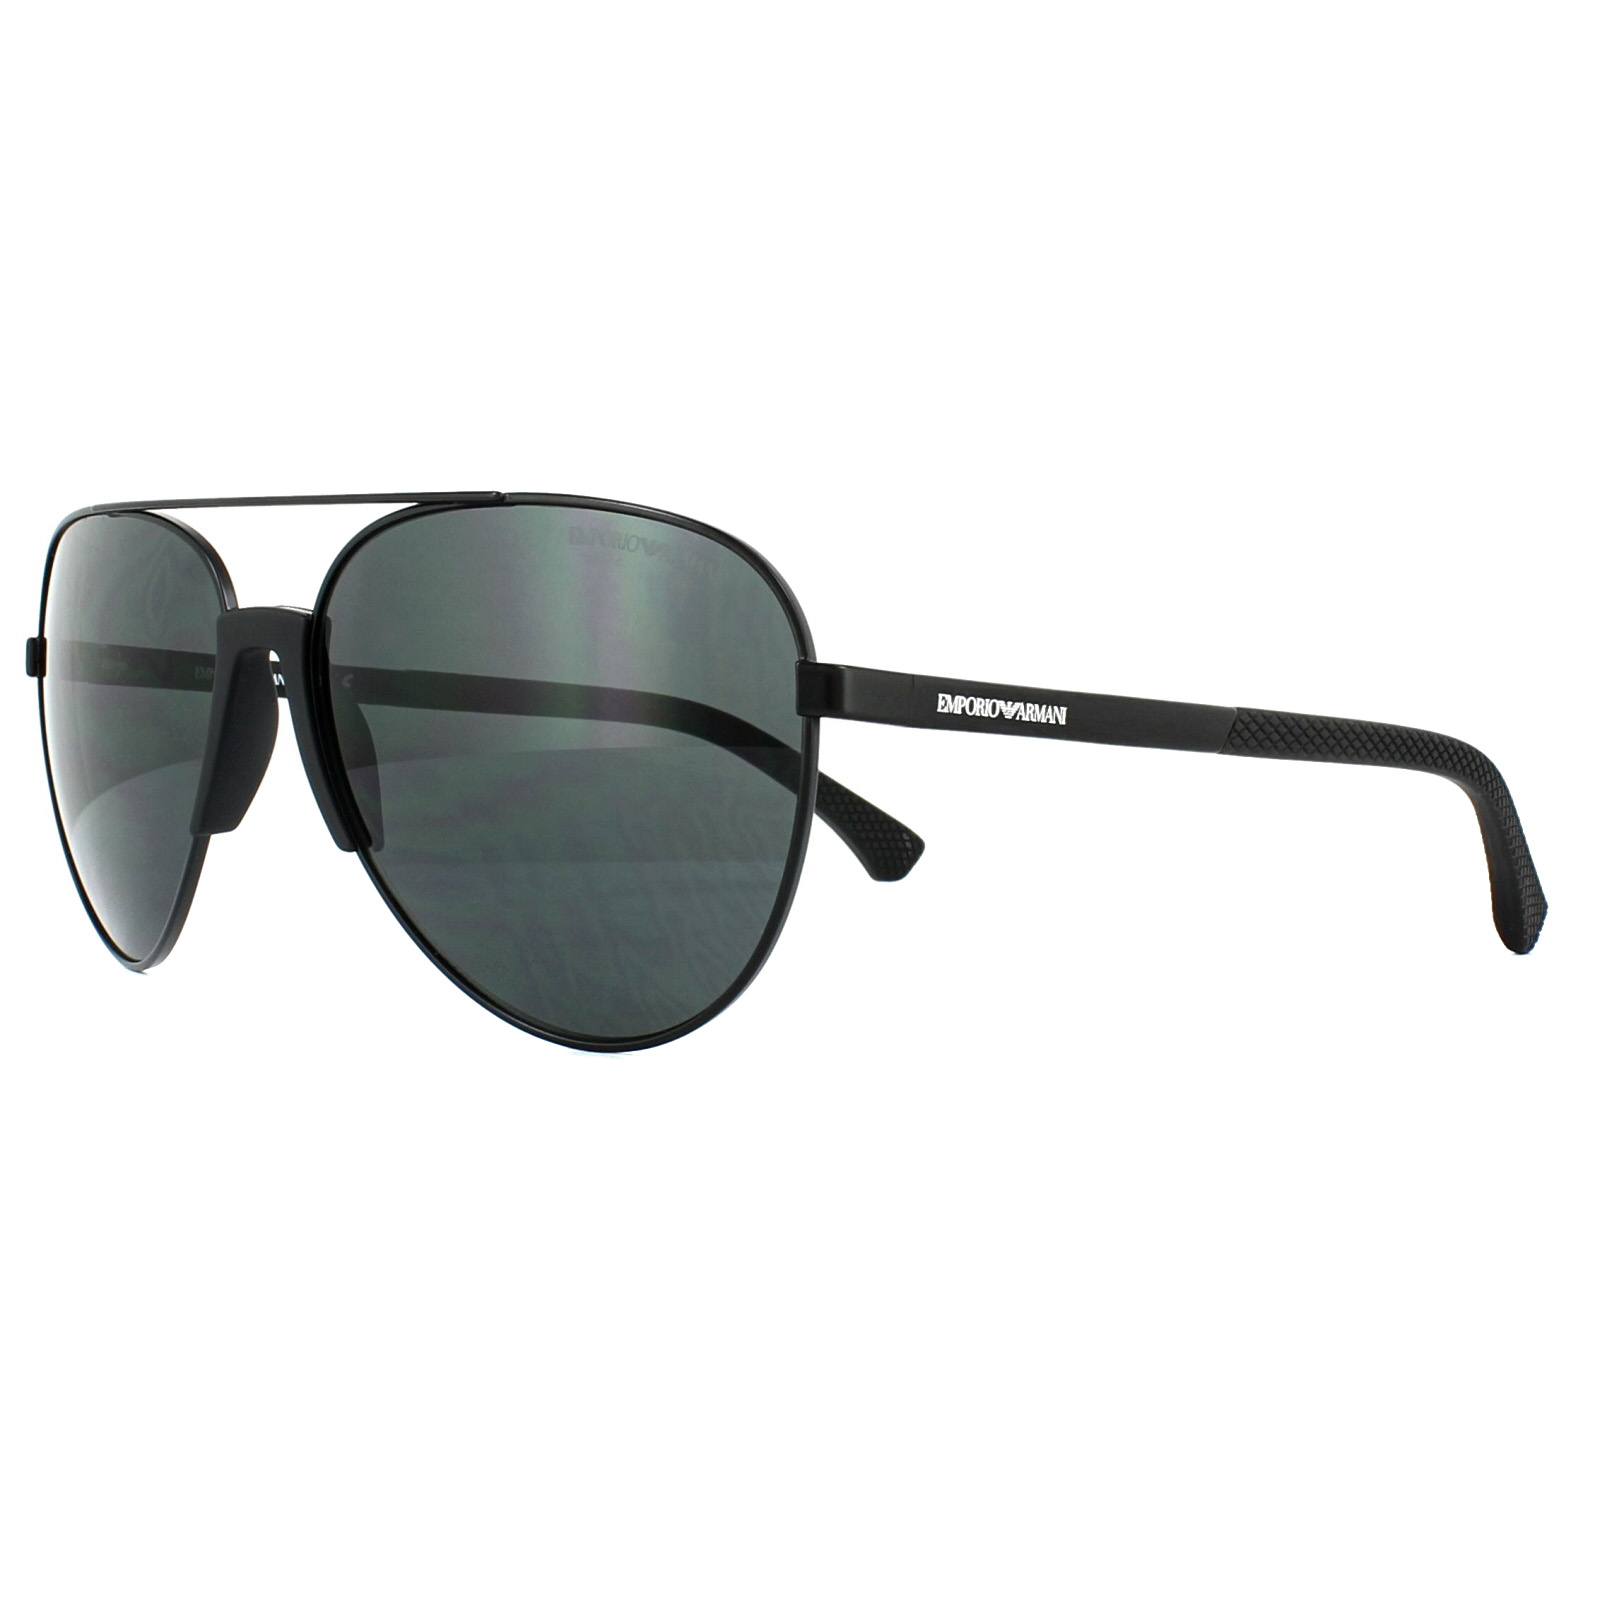 7a99f0336aaf Emporio Armani Sunglasses 2059 320387 Matt Black Grey 8053672810974 ...